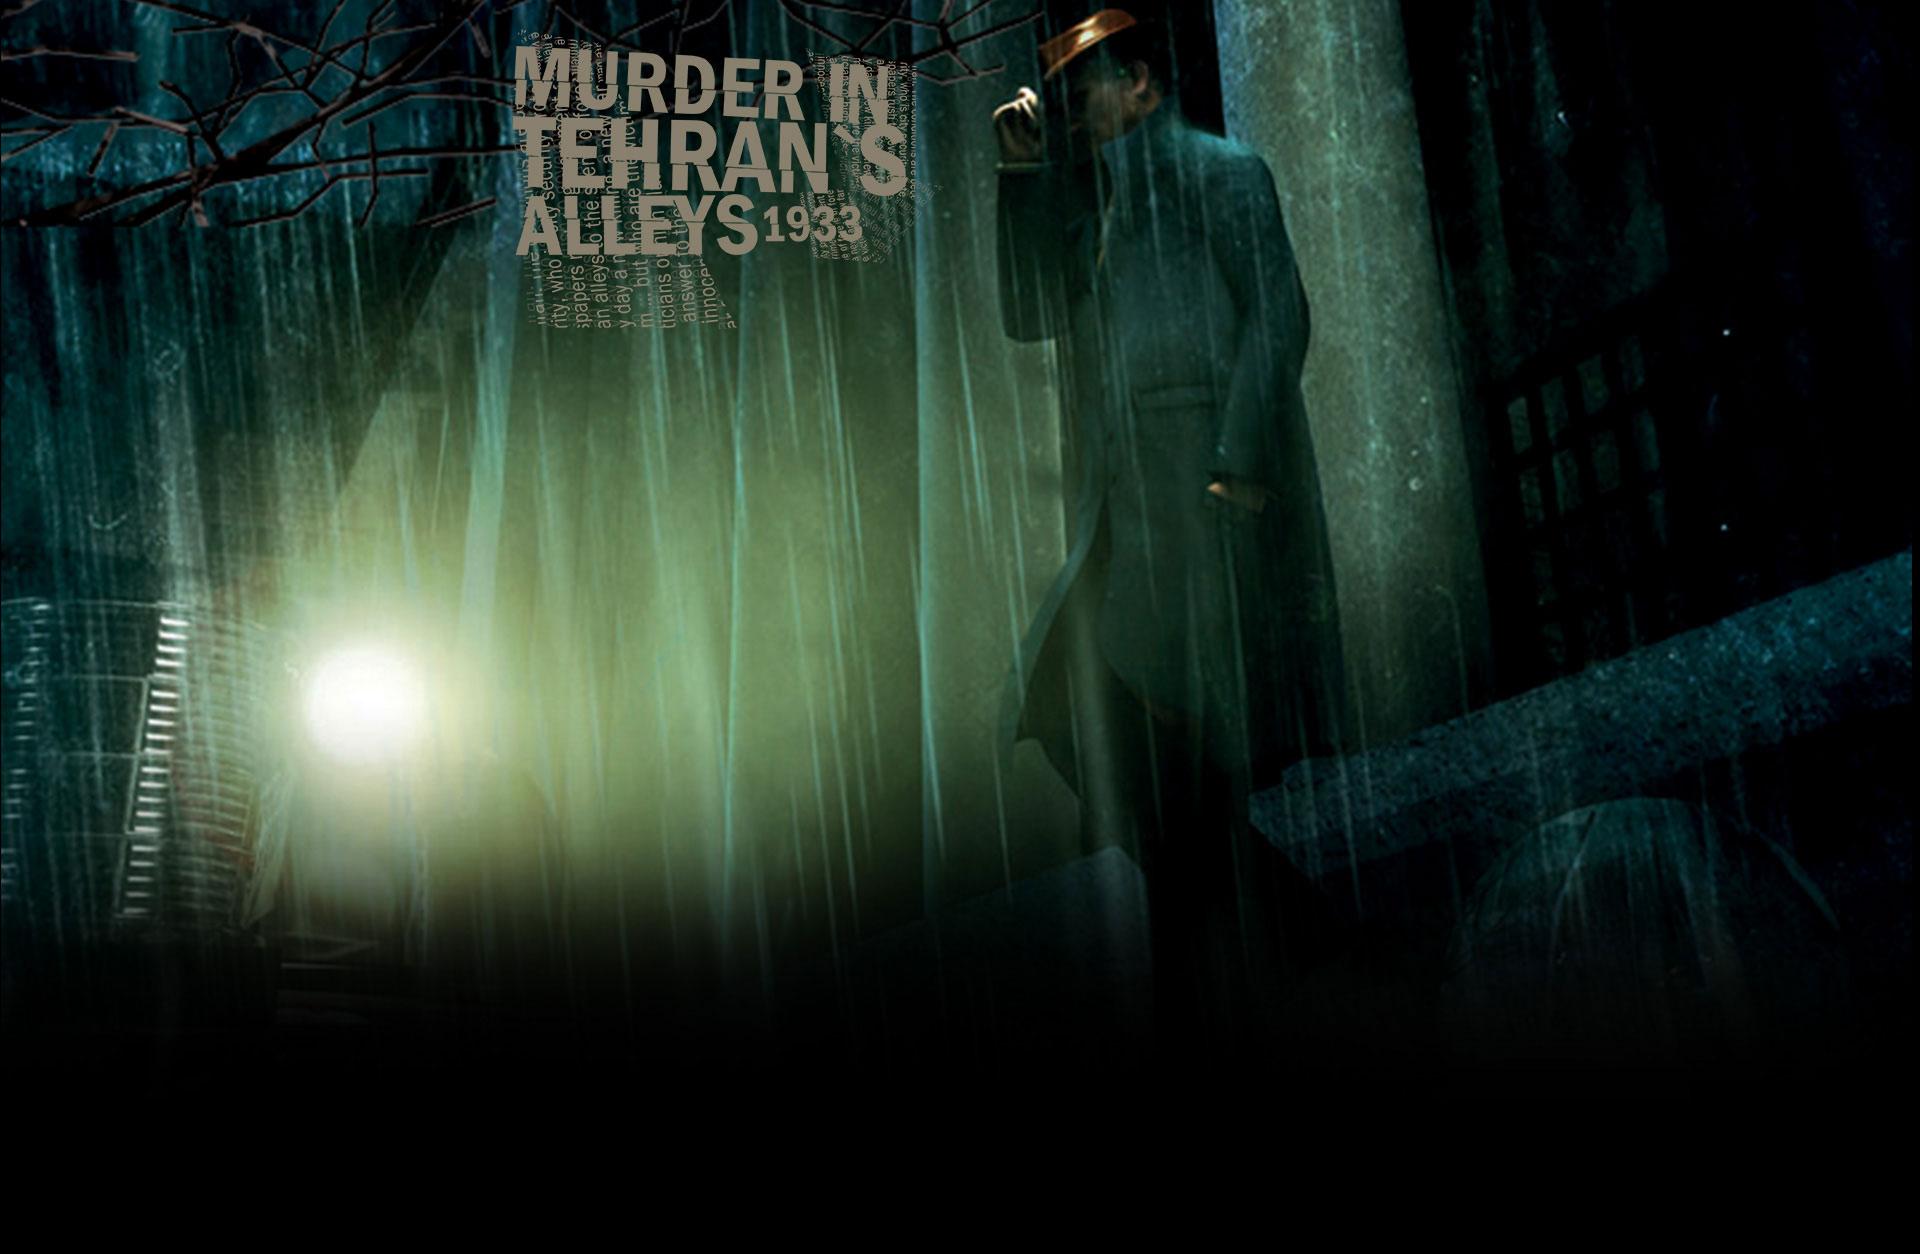 SF-MurderTehran-Alleys-1933_bg.jpg